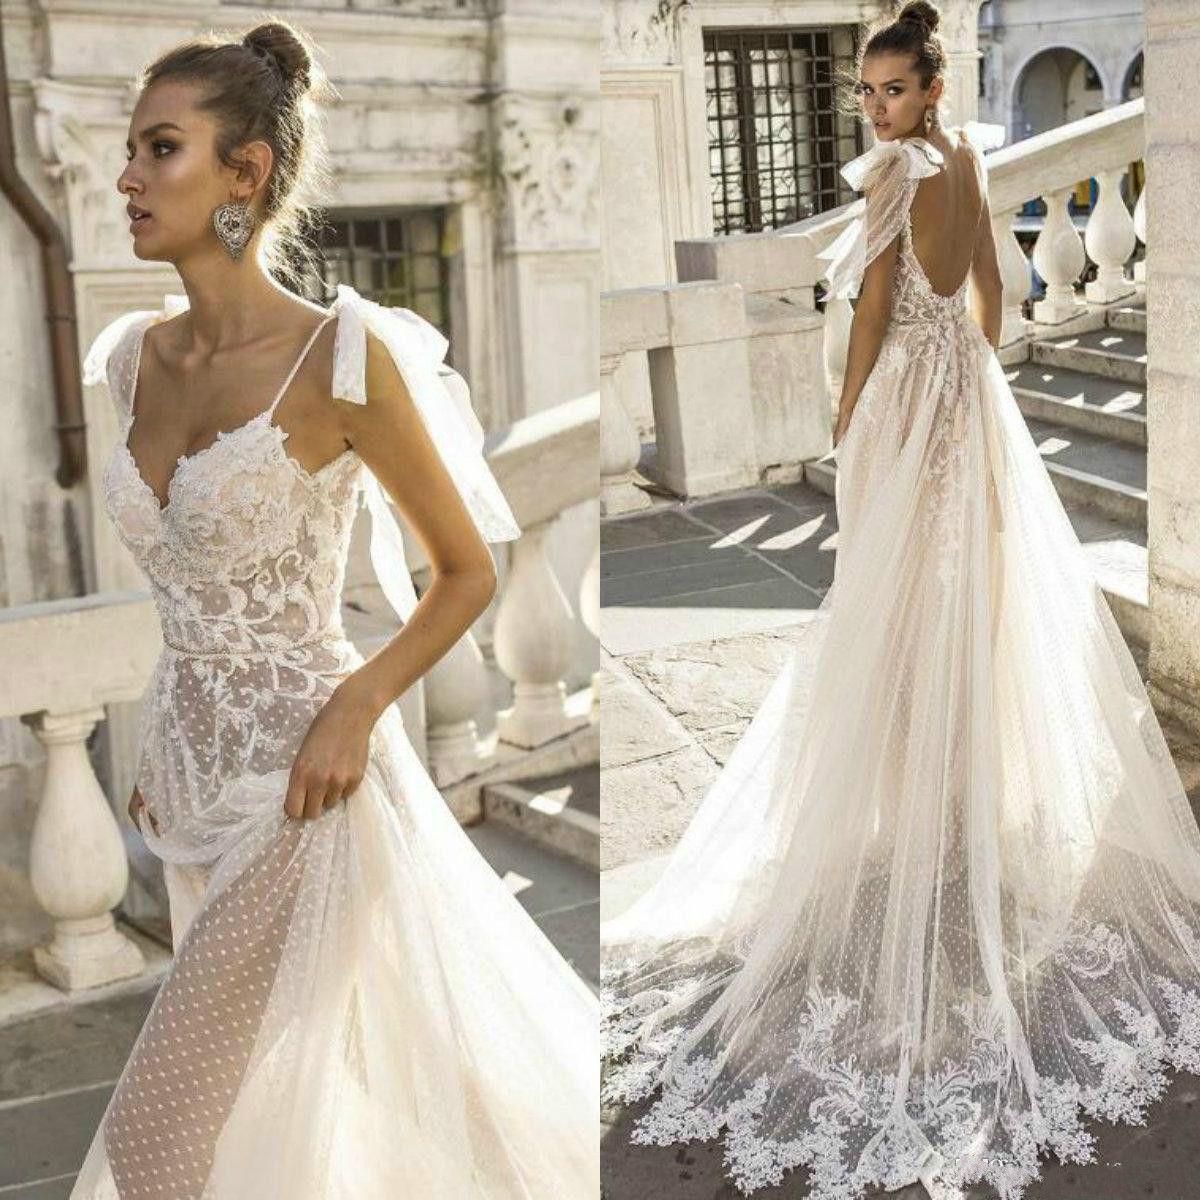 Bridal Gowns Under 300 64 Off Dktotal Dk